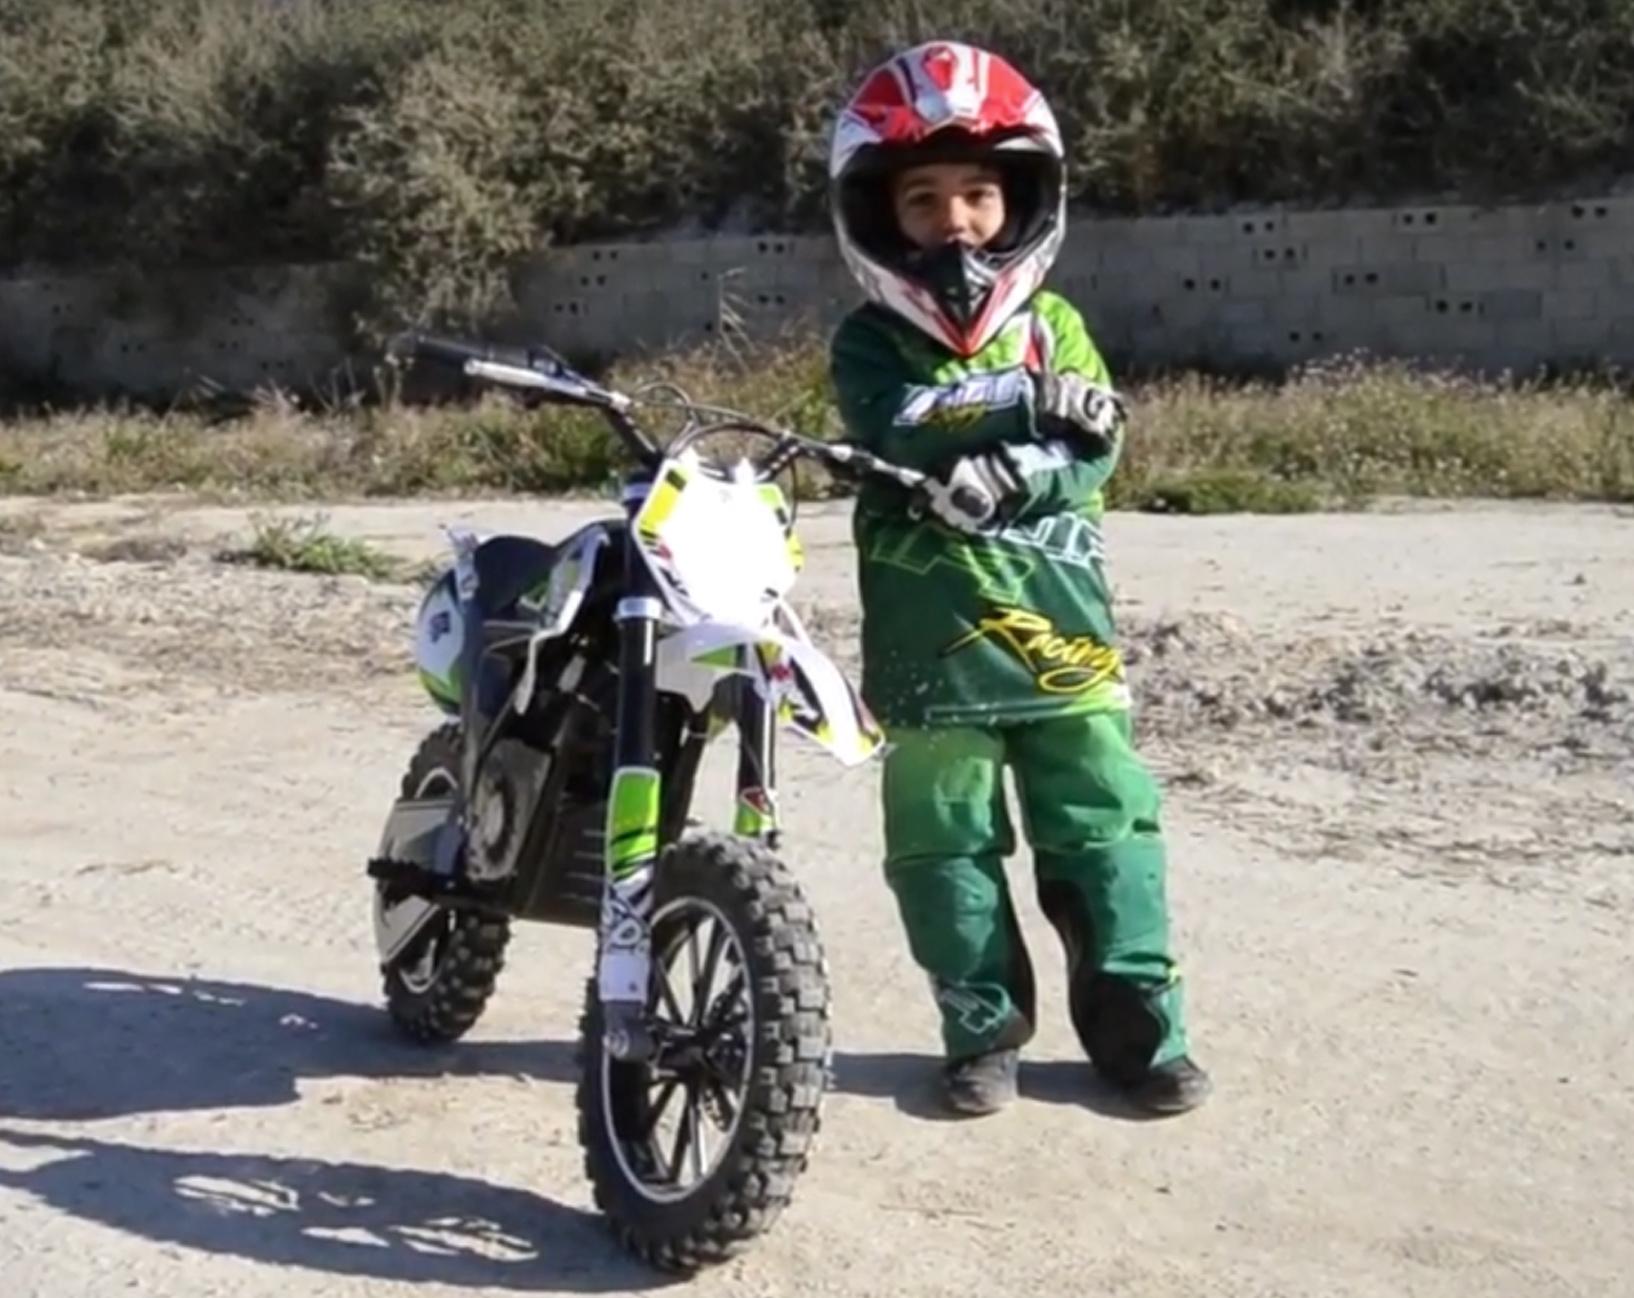 Minicross20MX5.jpg